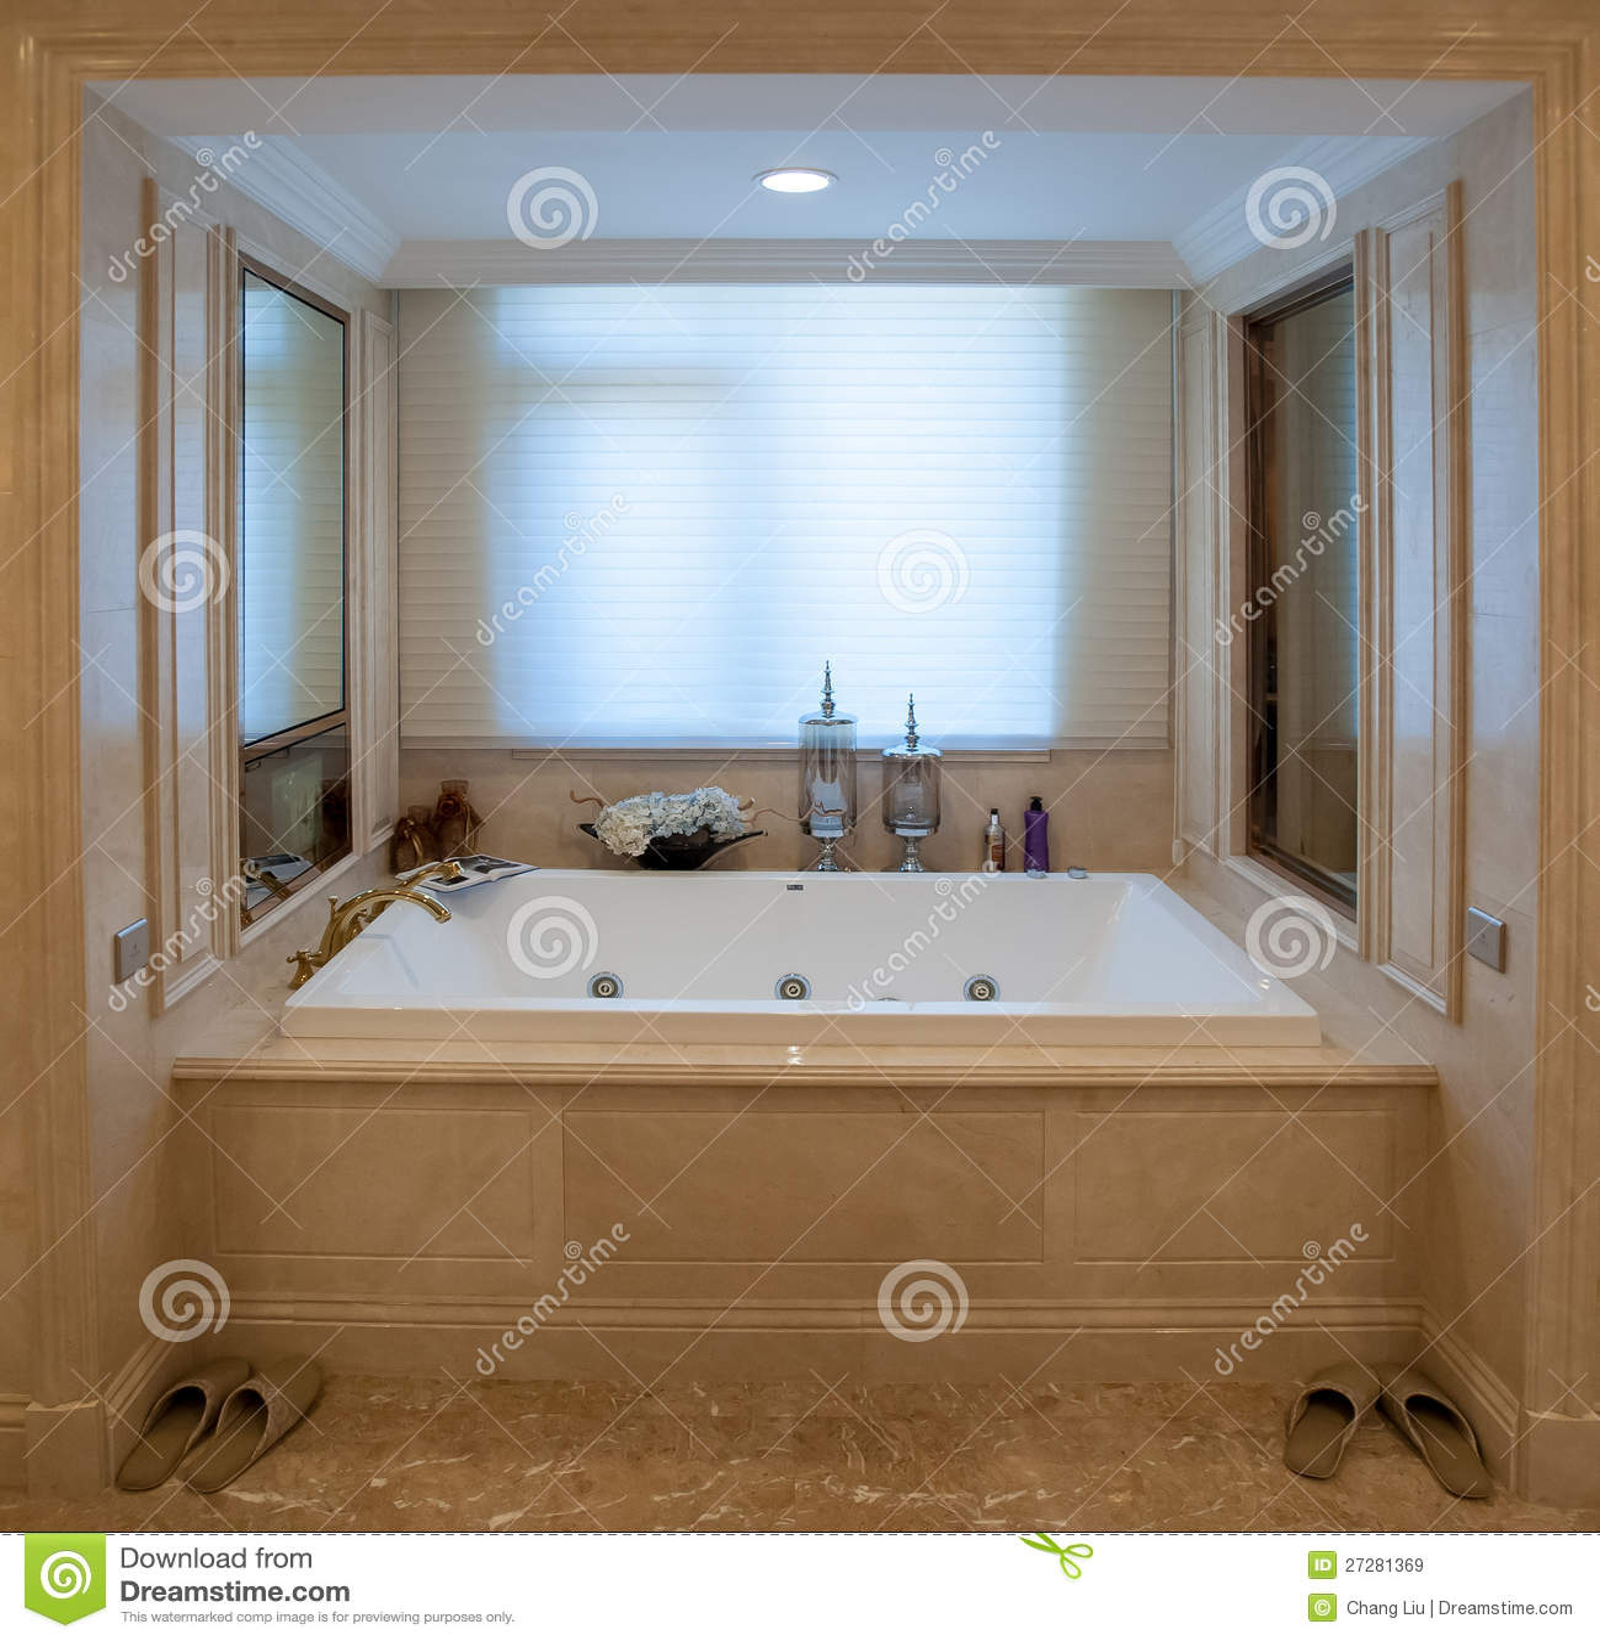 Vasca Da Bagno Quadrata.Vasca Quadrata Vasche Da Bagno Piccole Cose Di Casa